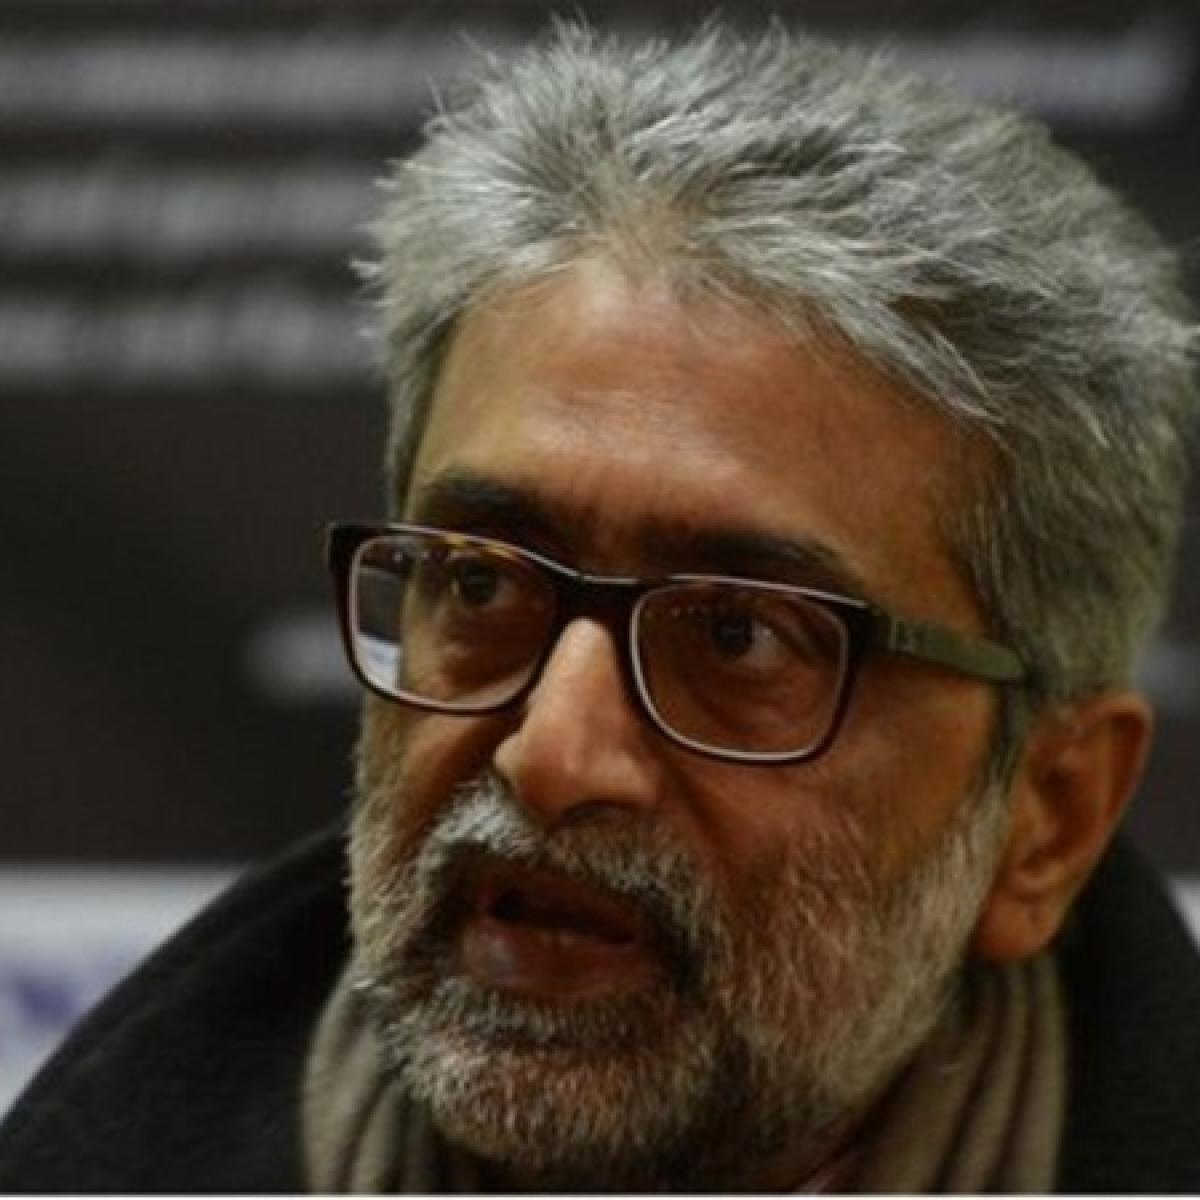 Bhima Koregaon case: Activist Gautam Navlakha shifted from Tihar to Taloja jail